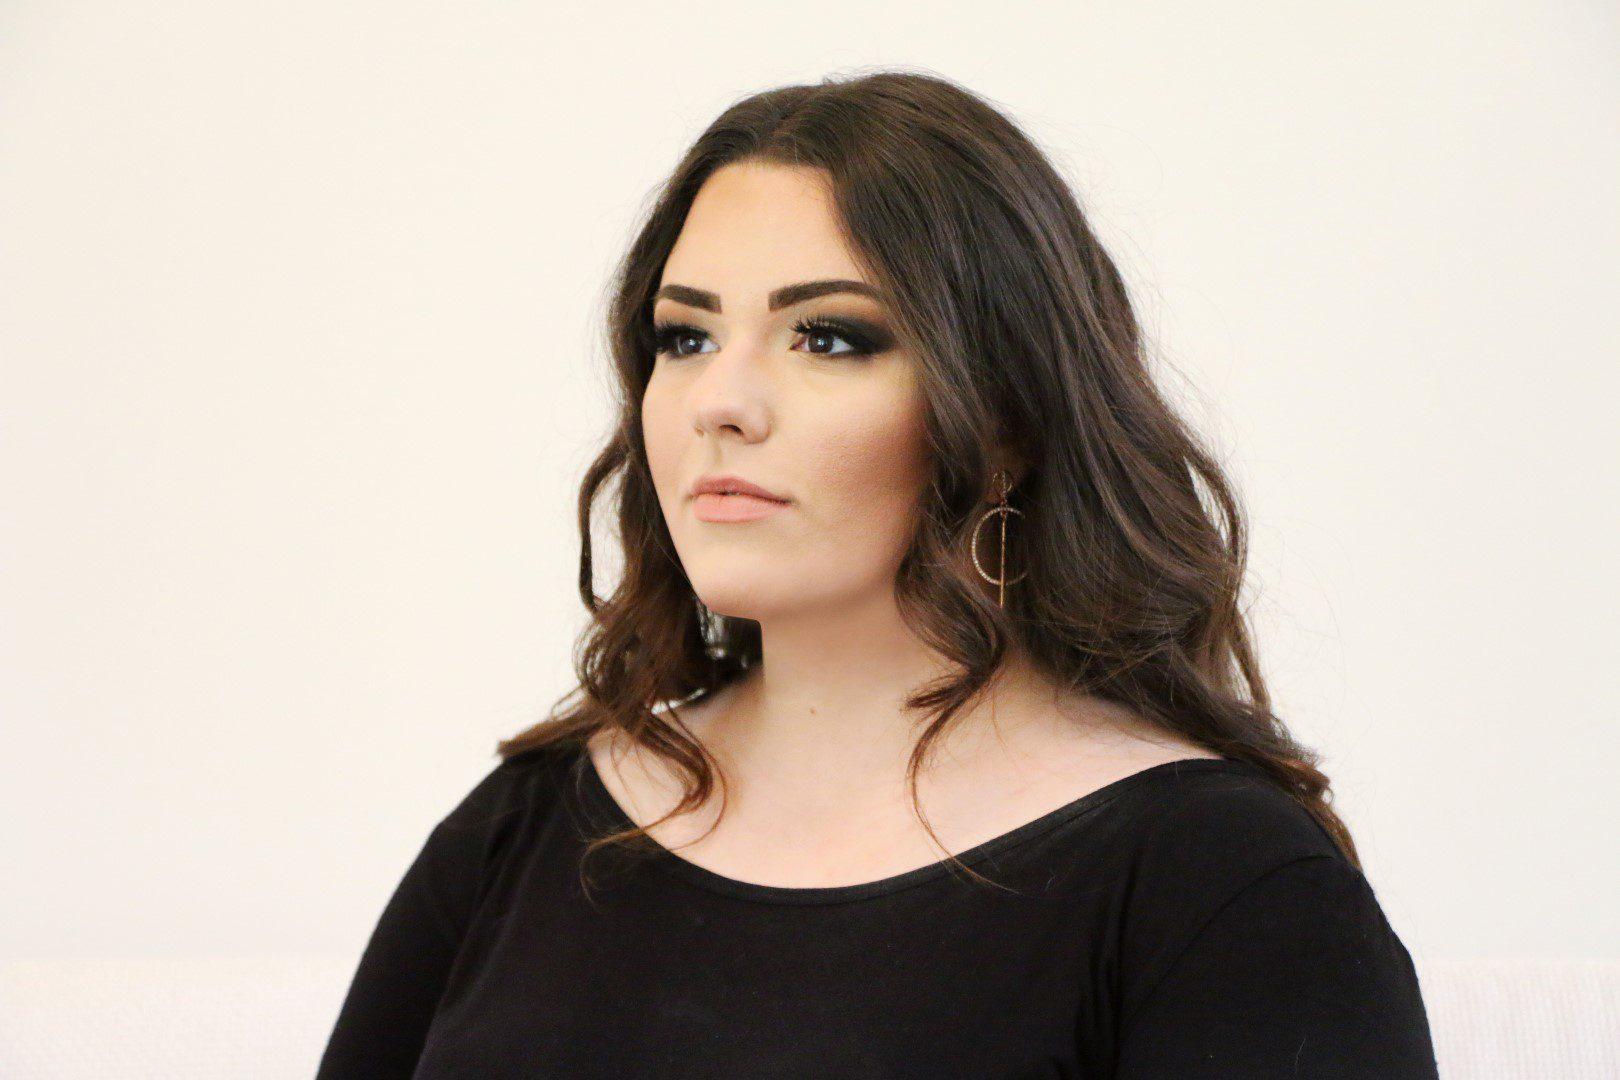 Gabriella Metz